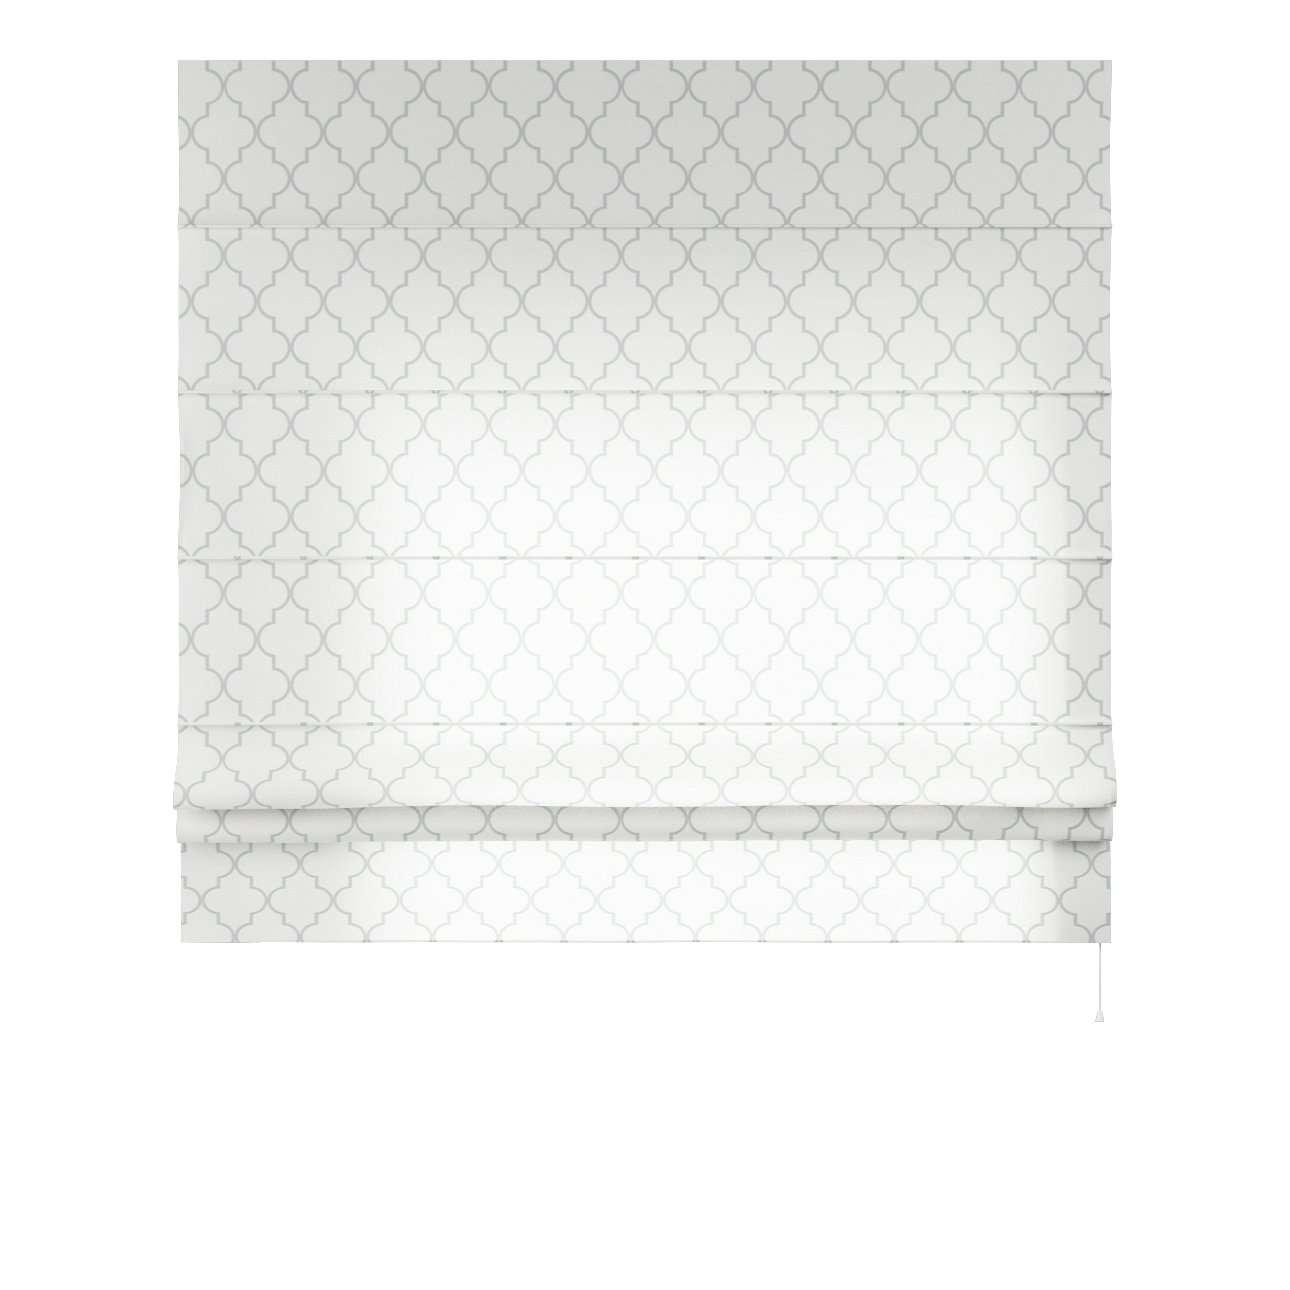 Foldegardin Paris<br/>Med lige flæse 80 x 170 cm fra kollektionen Comics, Stof: 137-85